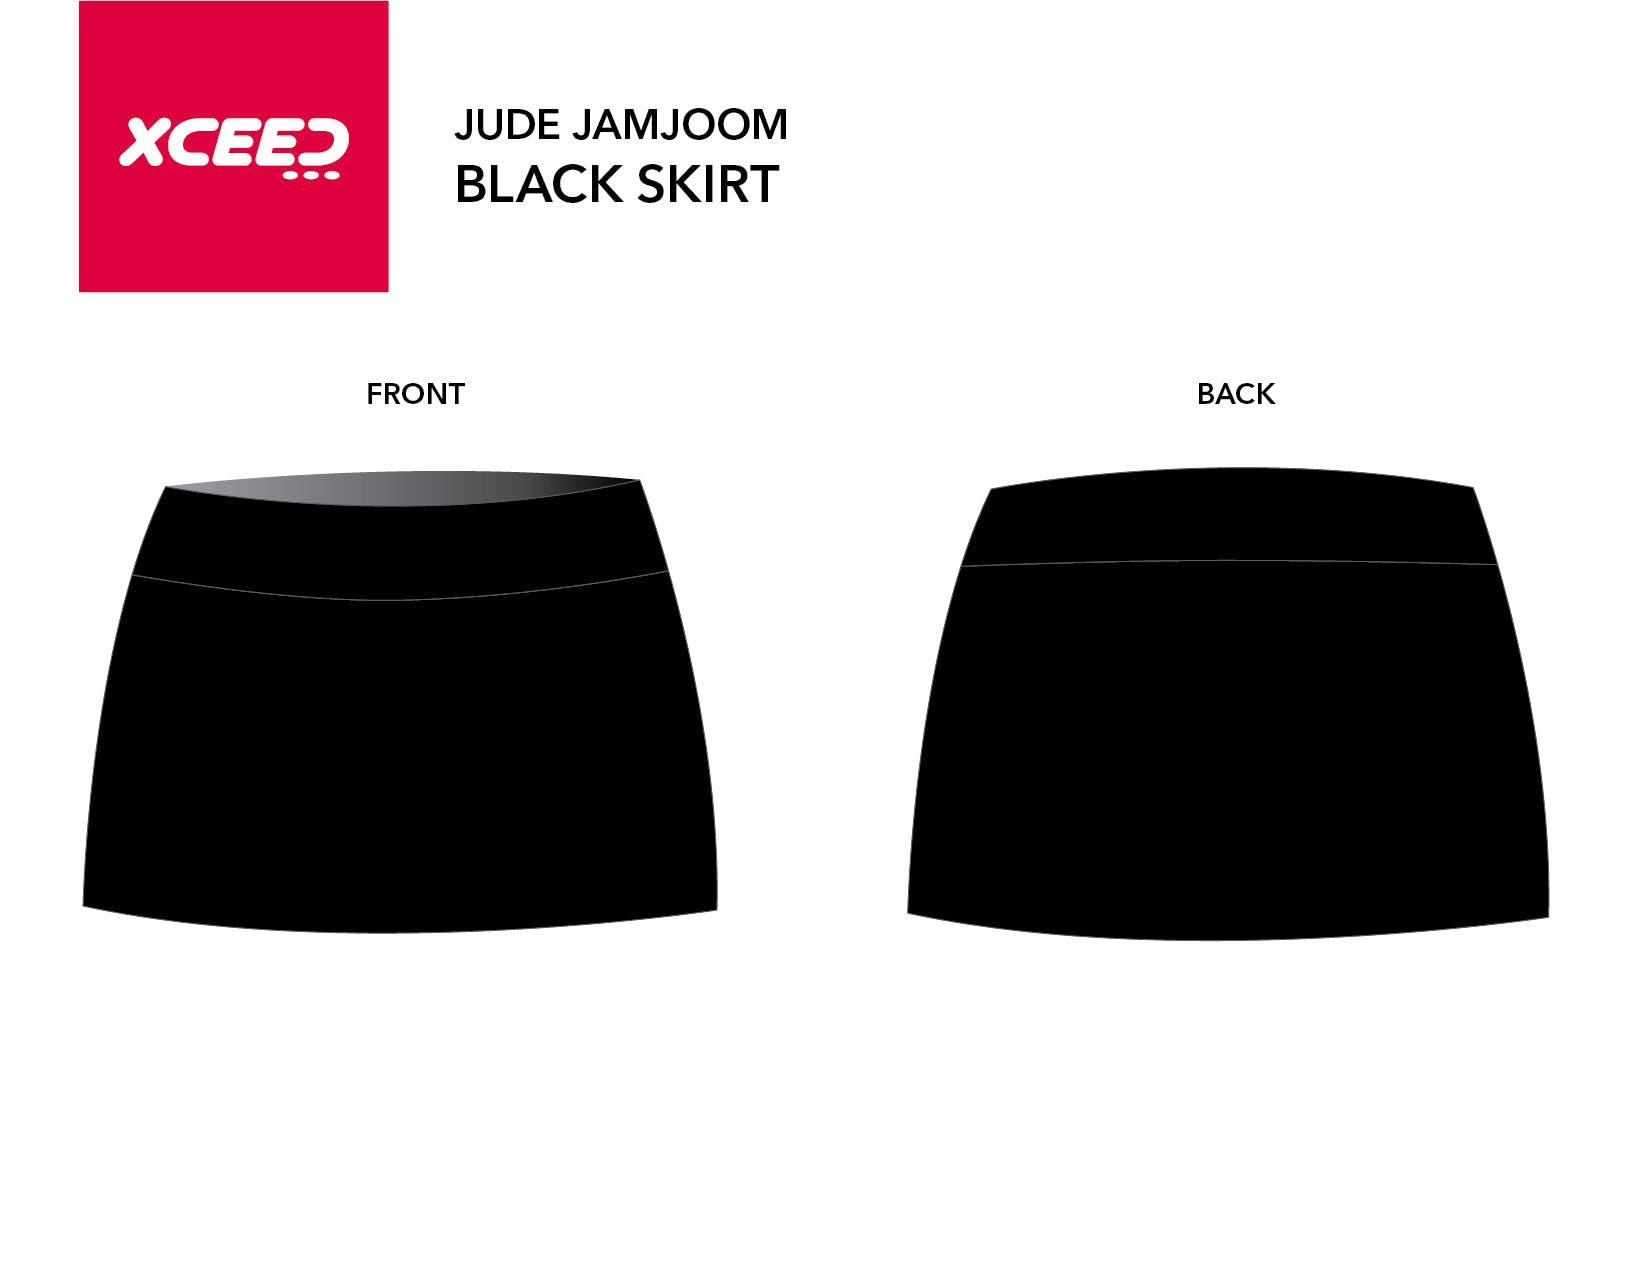 Black skirt Jude Jamjoom (COPY)